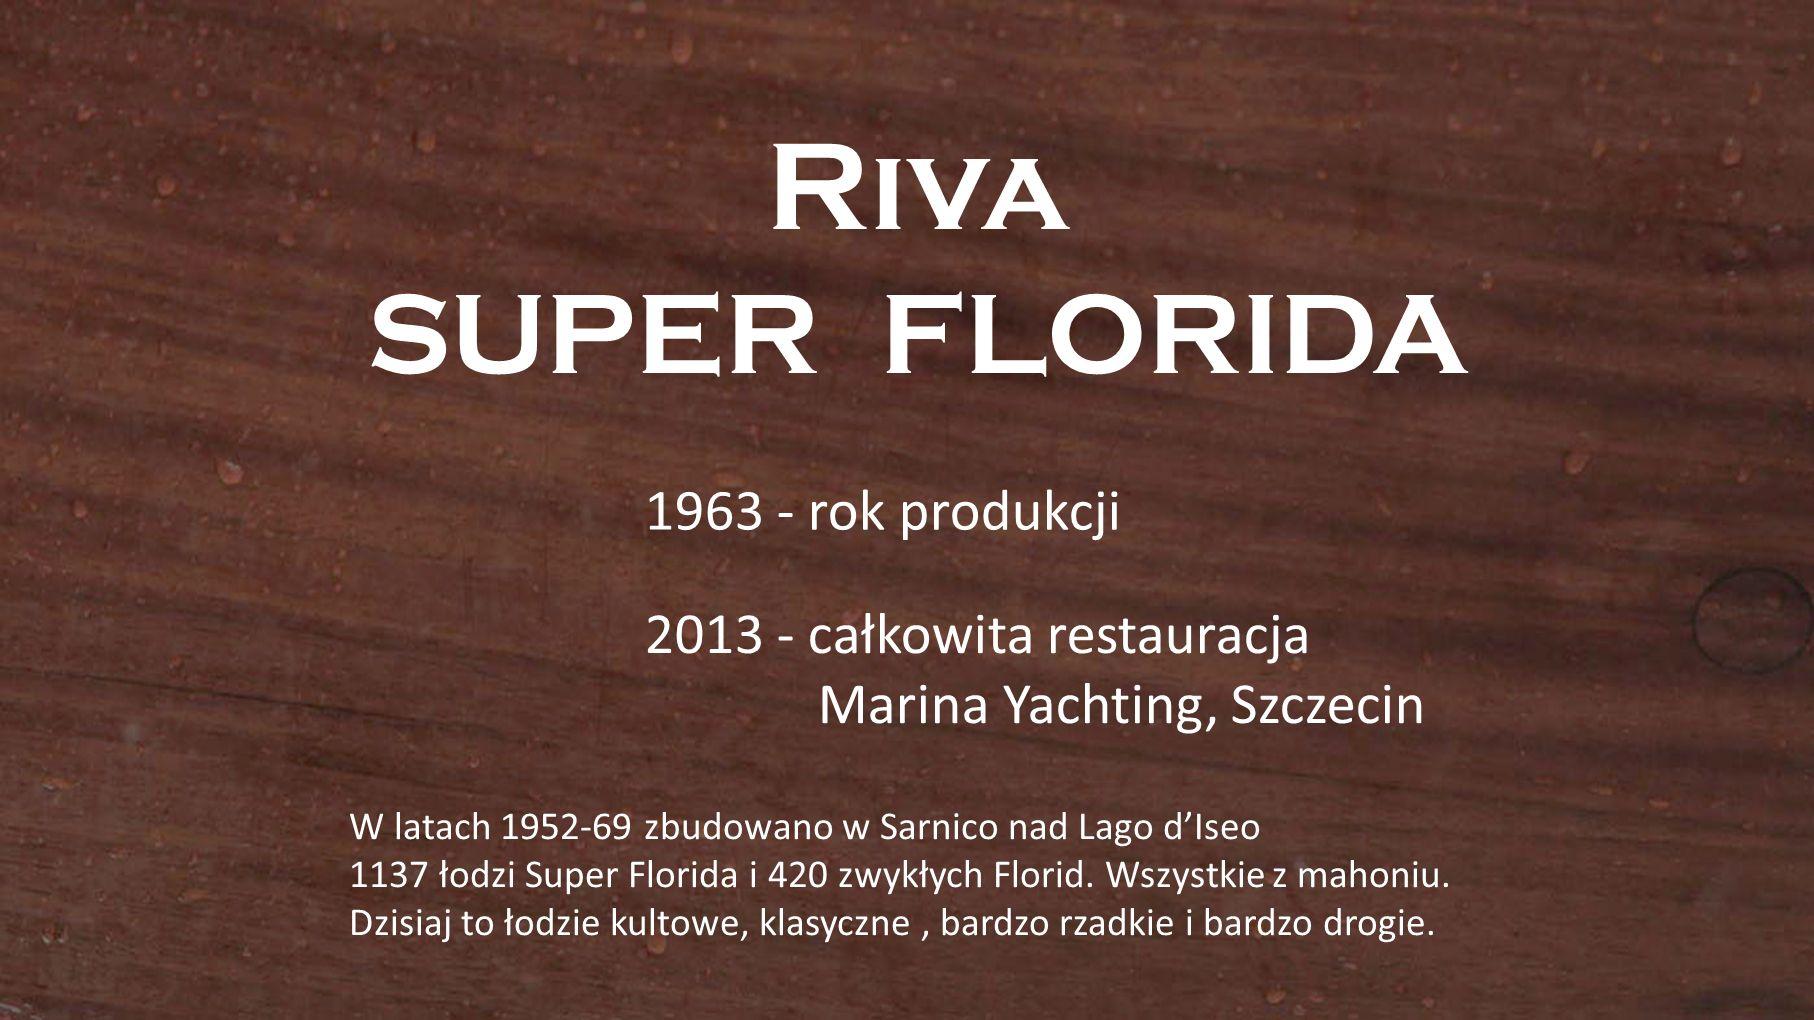 Riva SUPER FLORIDA 1963 - rok produkcji 2013 - całkowita restauracja